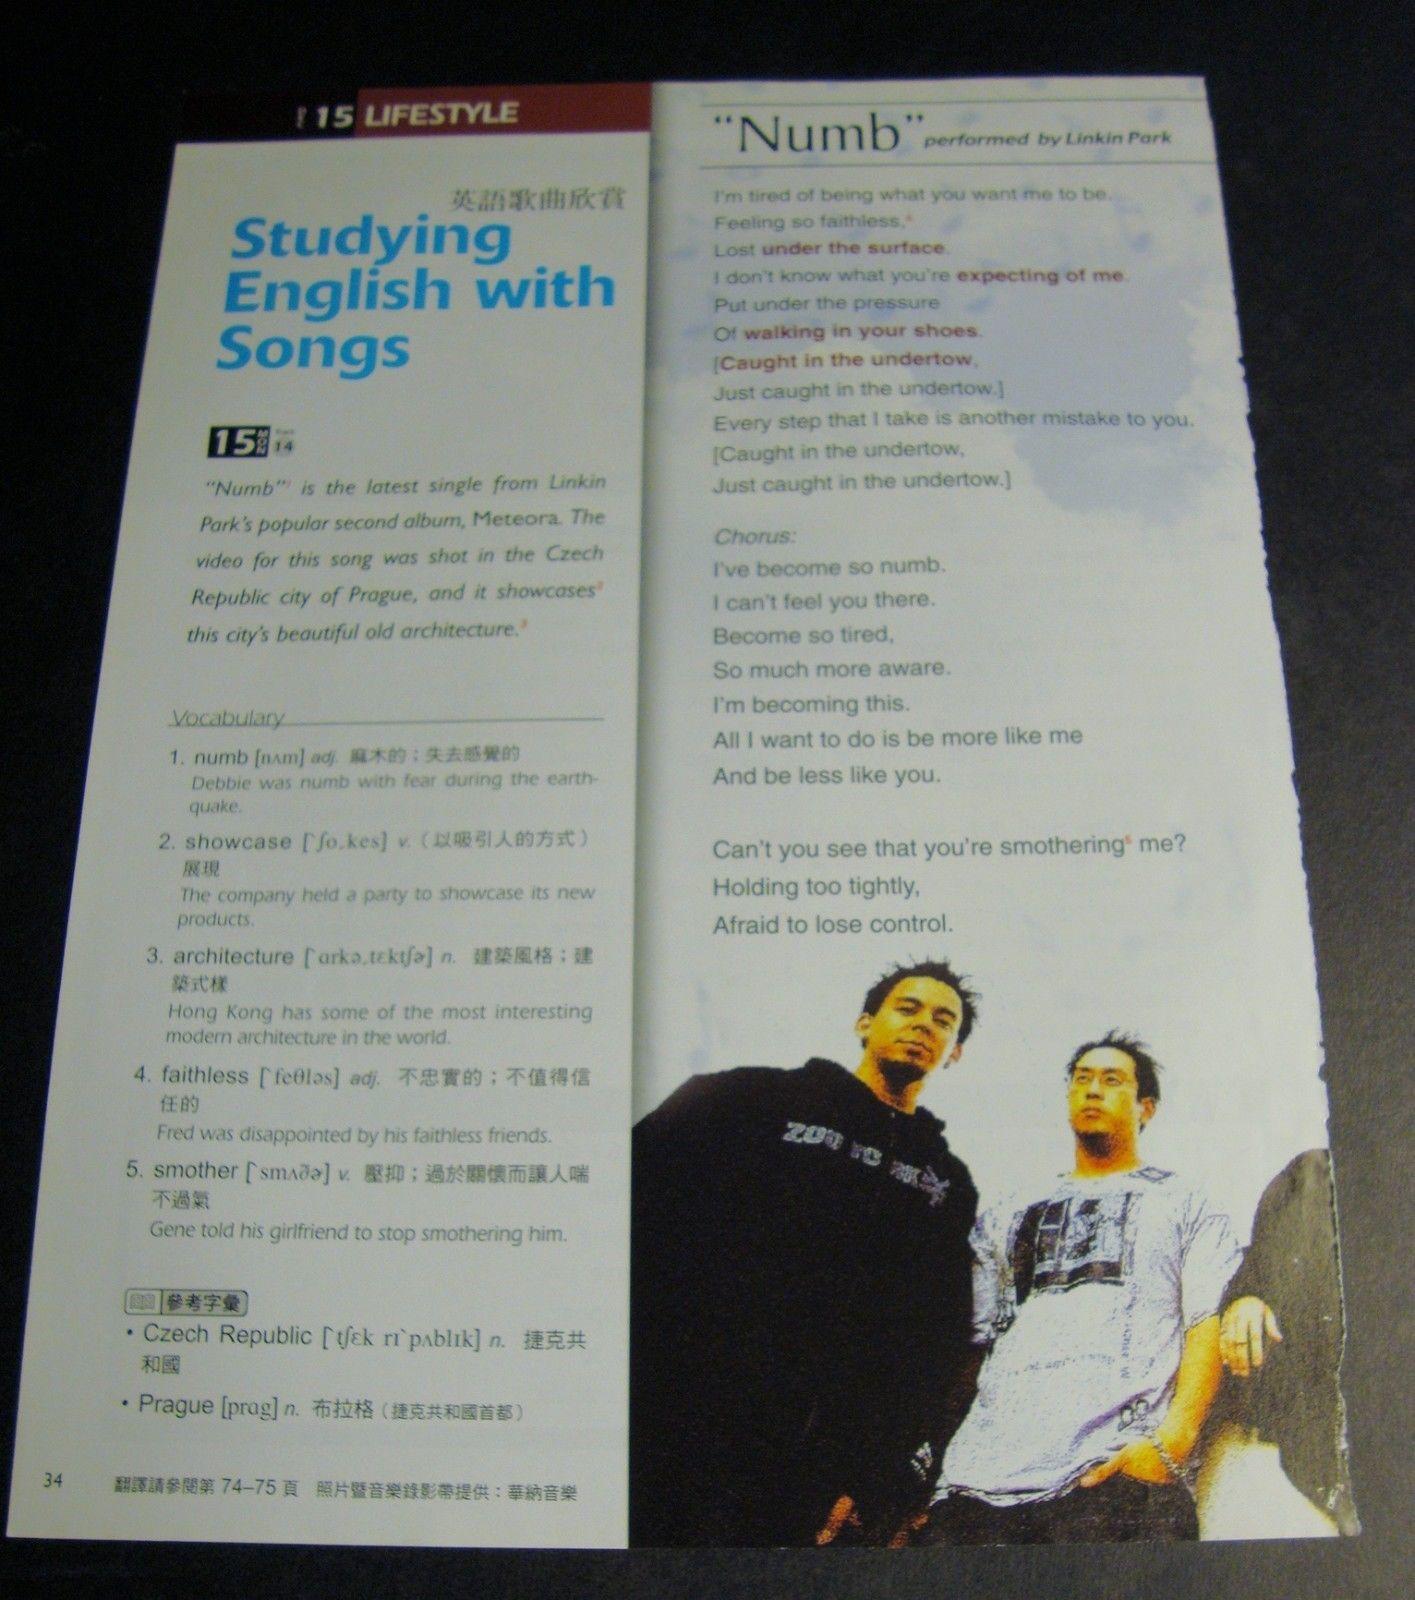 Linkin Park Numb Lyrics 2 Taiwan magazine and 37 similar items